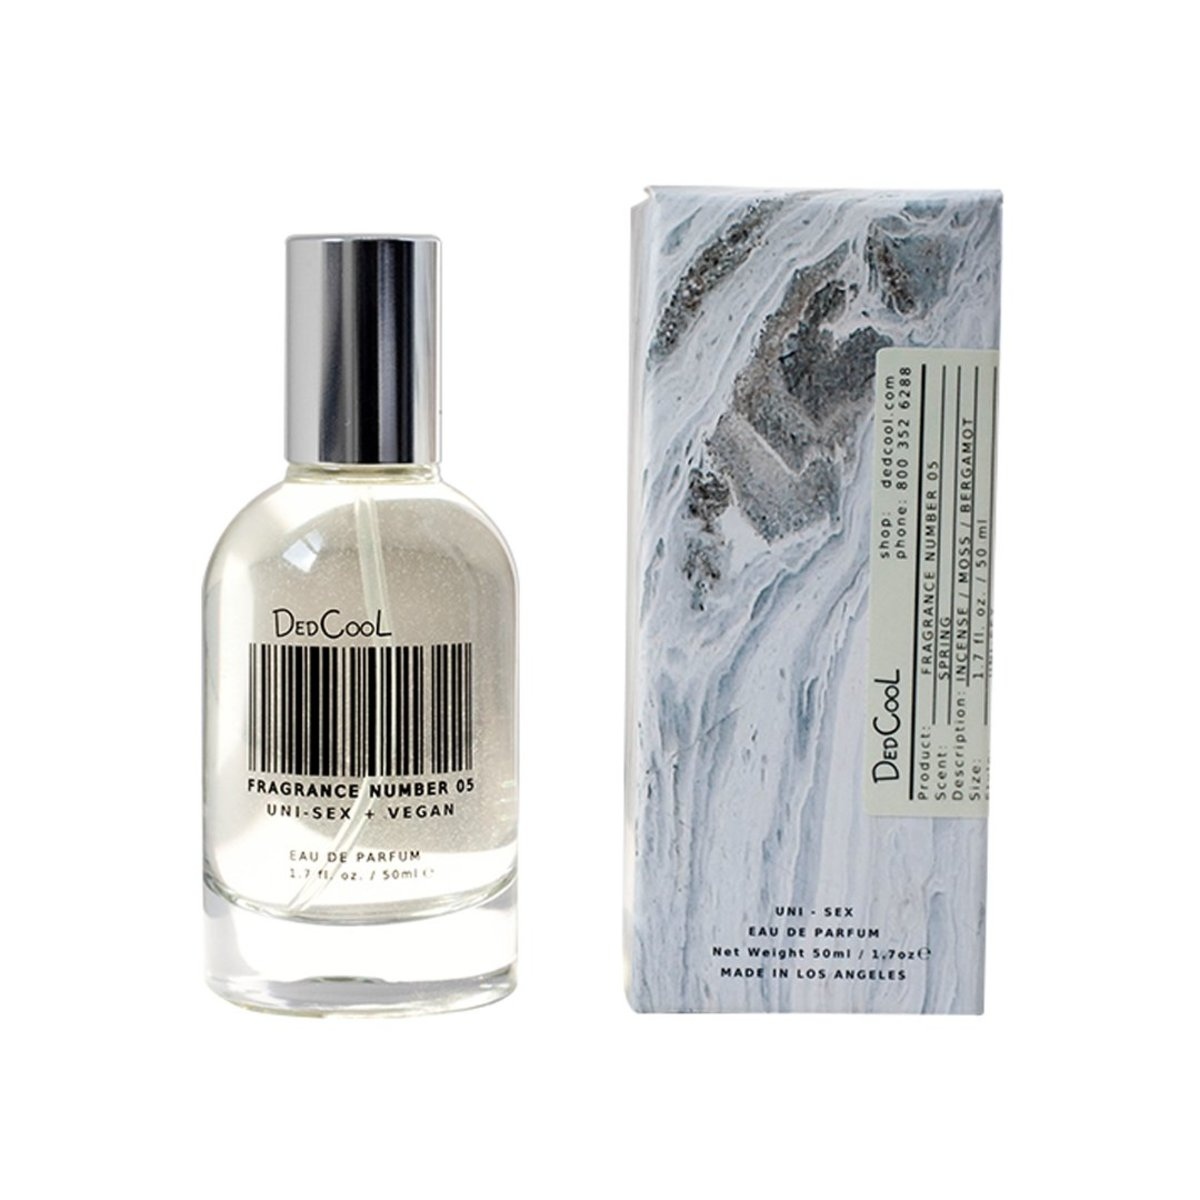 dedcool_fragrance_number_05_at_credo_beauty_6aaa82ac-a1e8-4c4f-93a1-10d0225cee9b_2000x